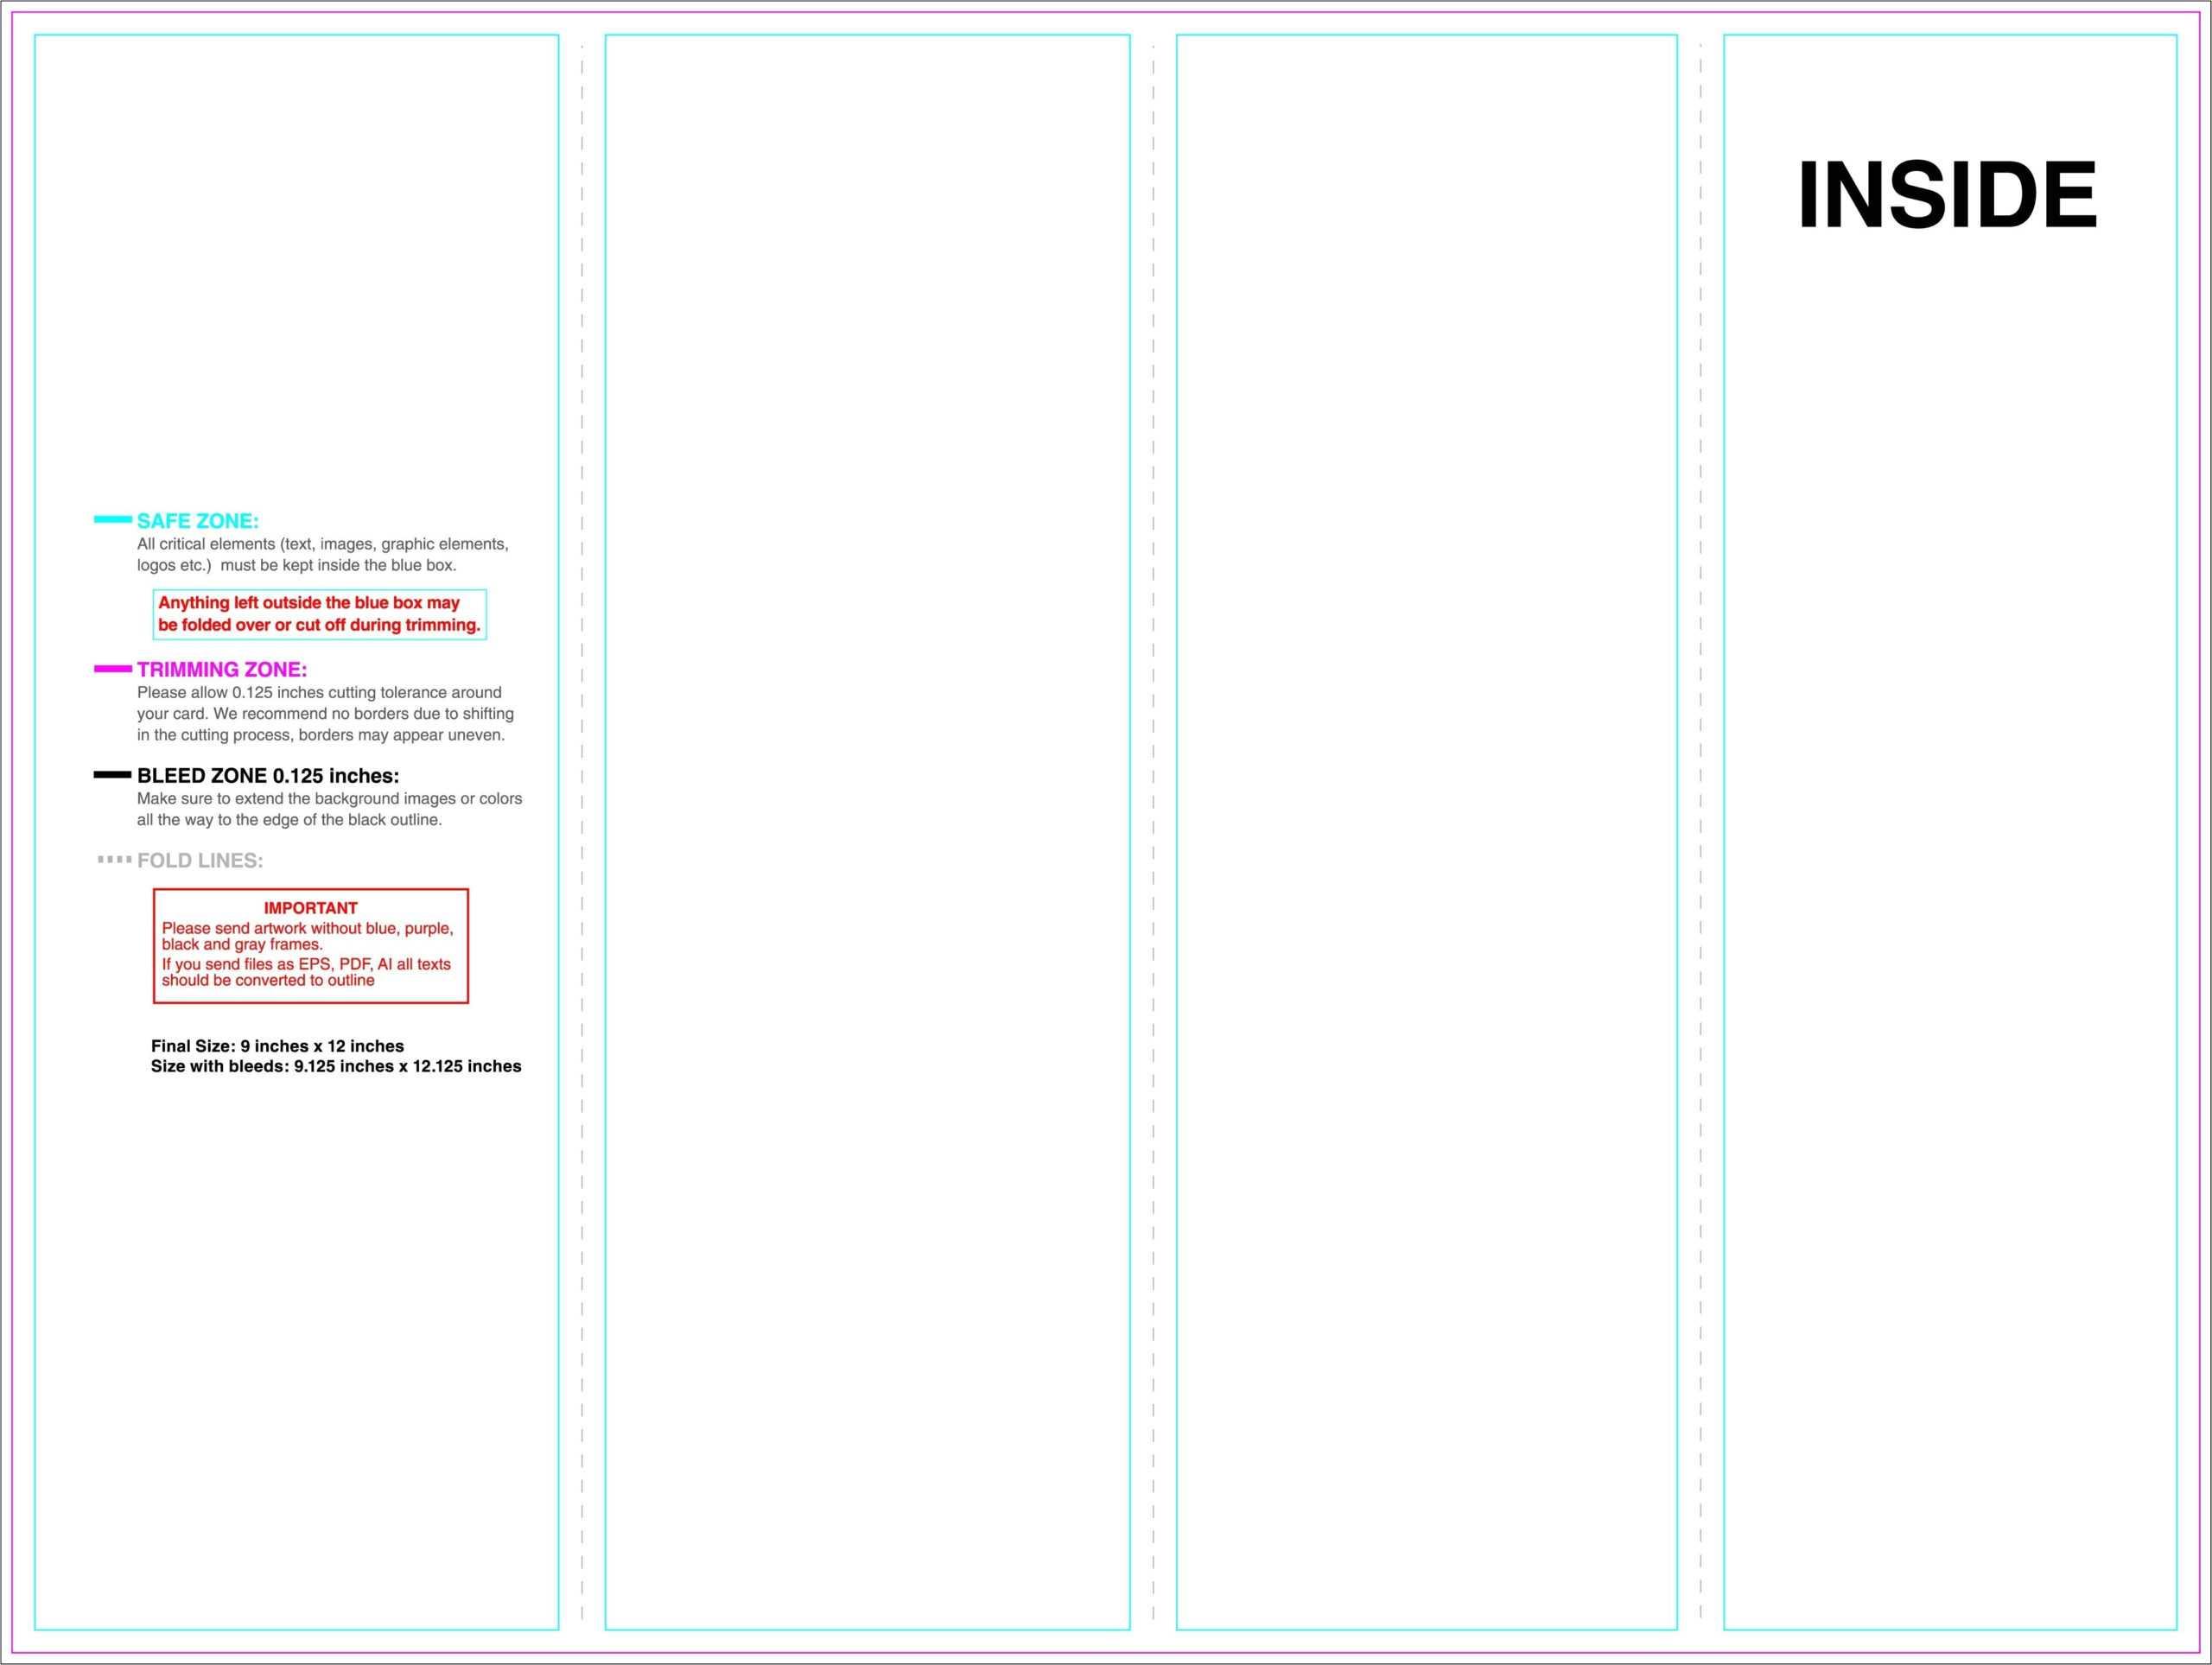 Copy Of Science Brochure Template Google Docs Outline Within Science Brochure Template Google Docs